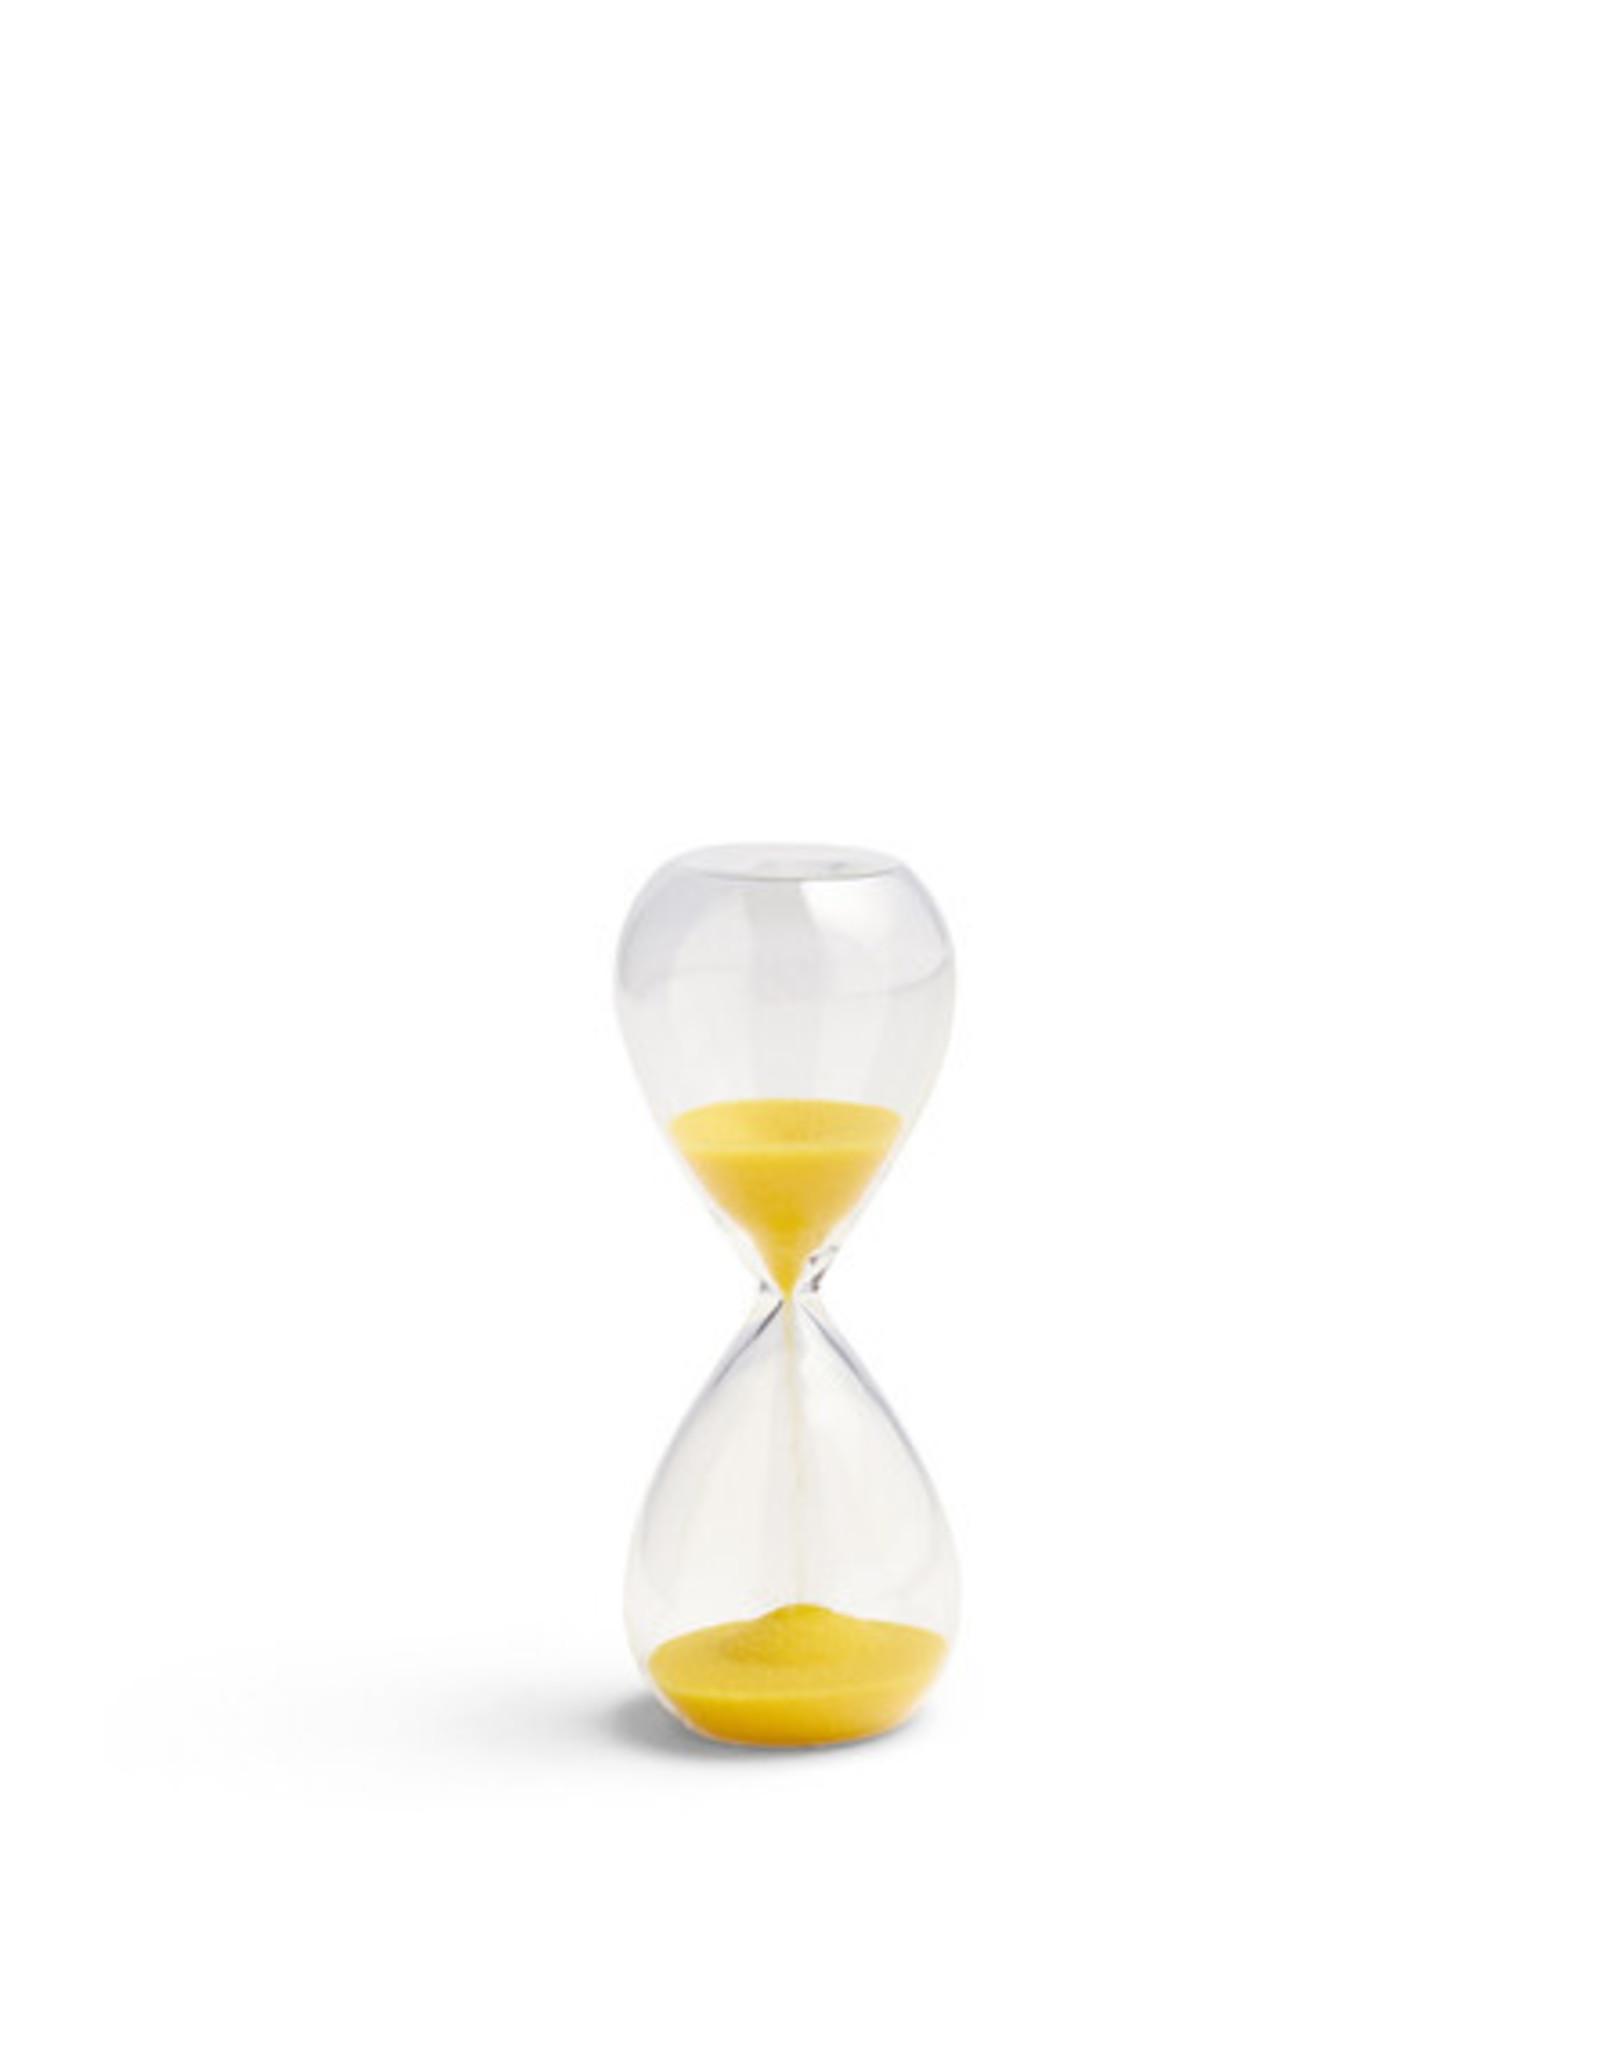 HAY HAY Time 3 min S lemon yellow